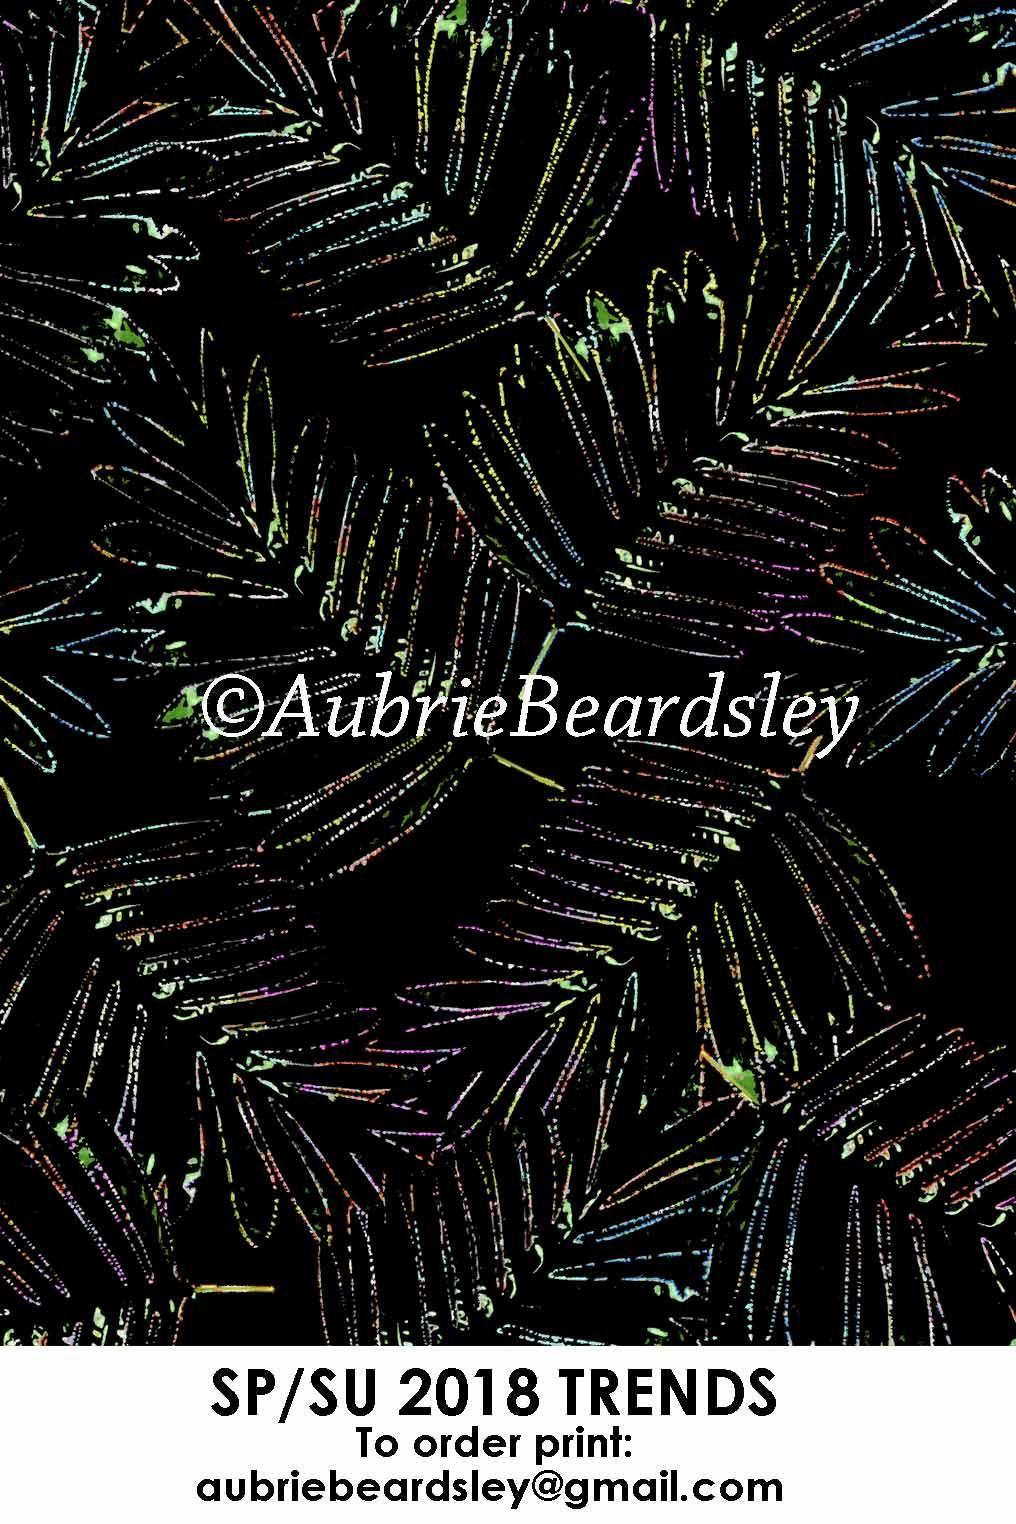 ©aubrie beardsley #textile #pattern #print #tropical #palms #swimwear #active #2018 #textiledesign #textiledesigner #designer